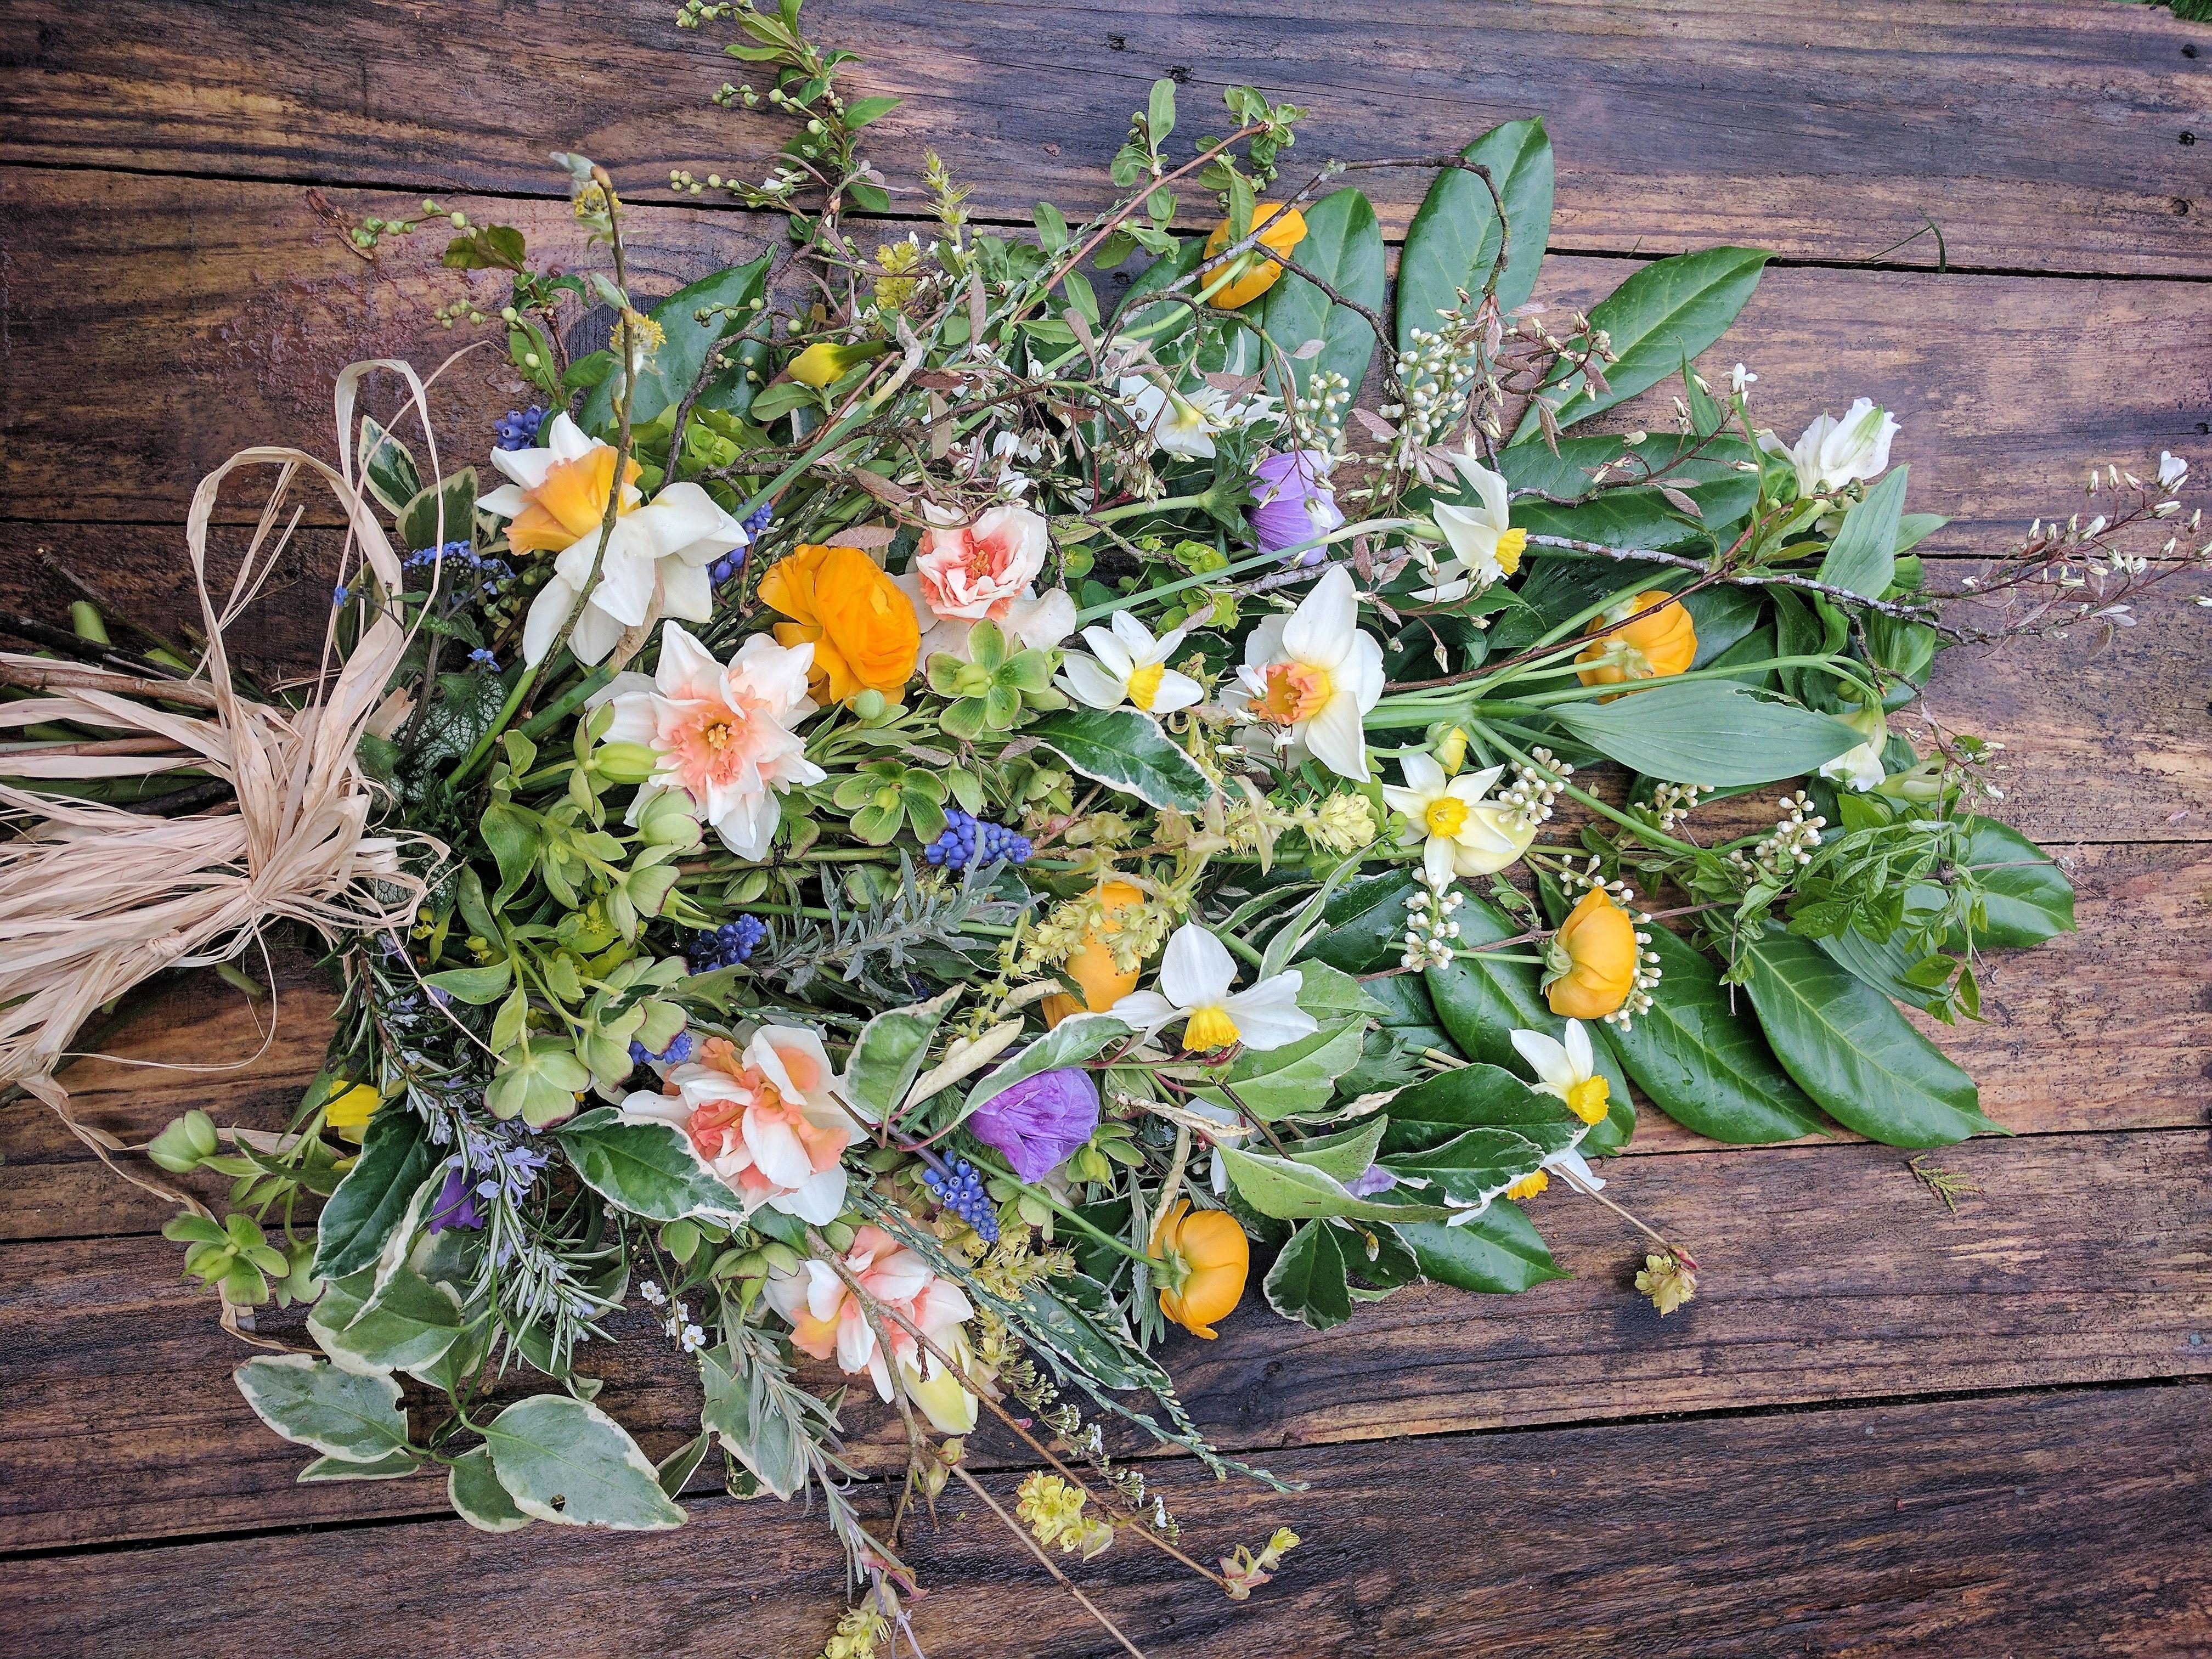 Daffodils Bluebells Funeral Sheaf All British Natural Floral